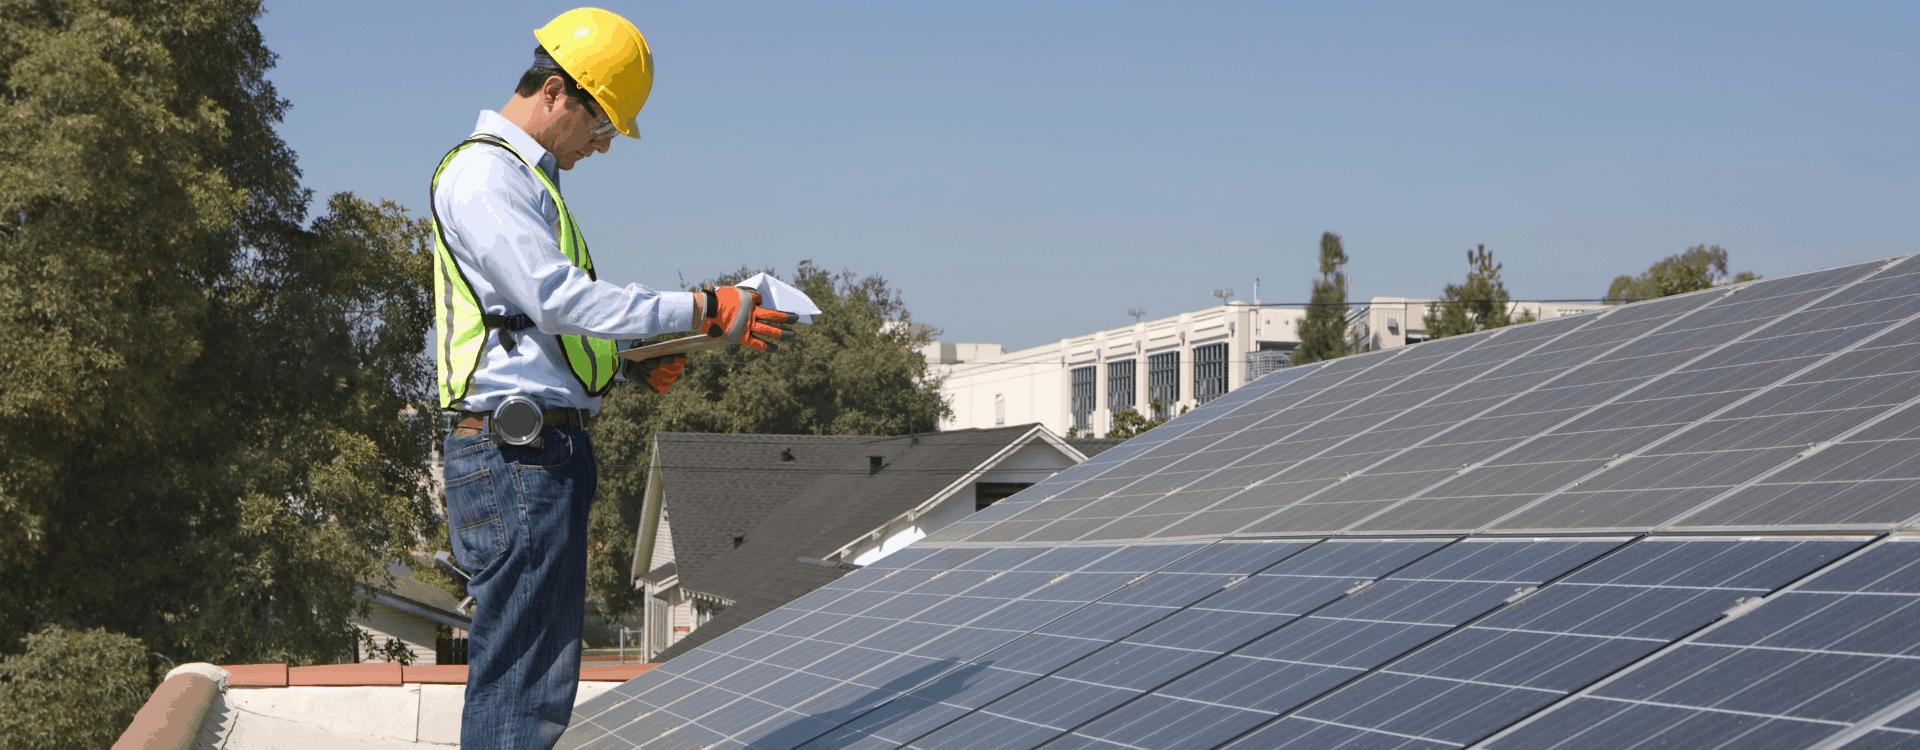 competencias-proyectos-fotovoltaica